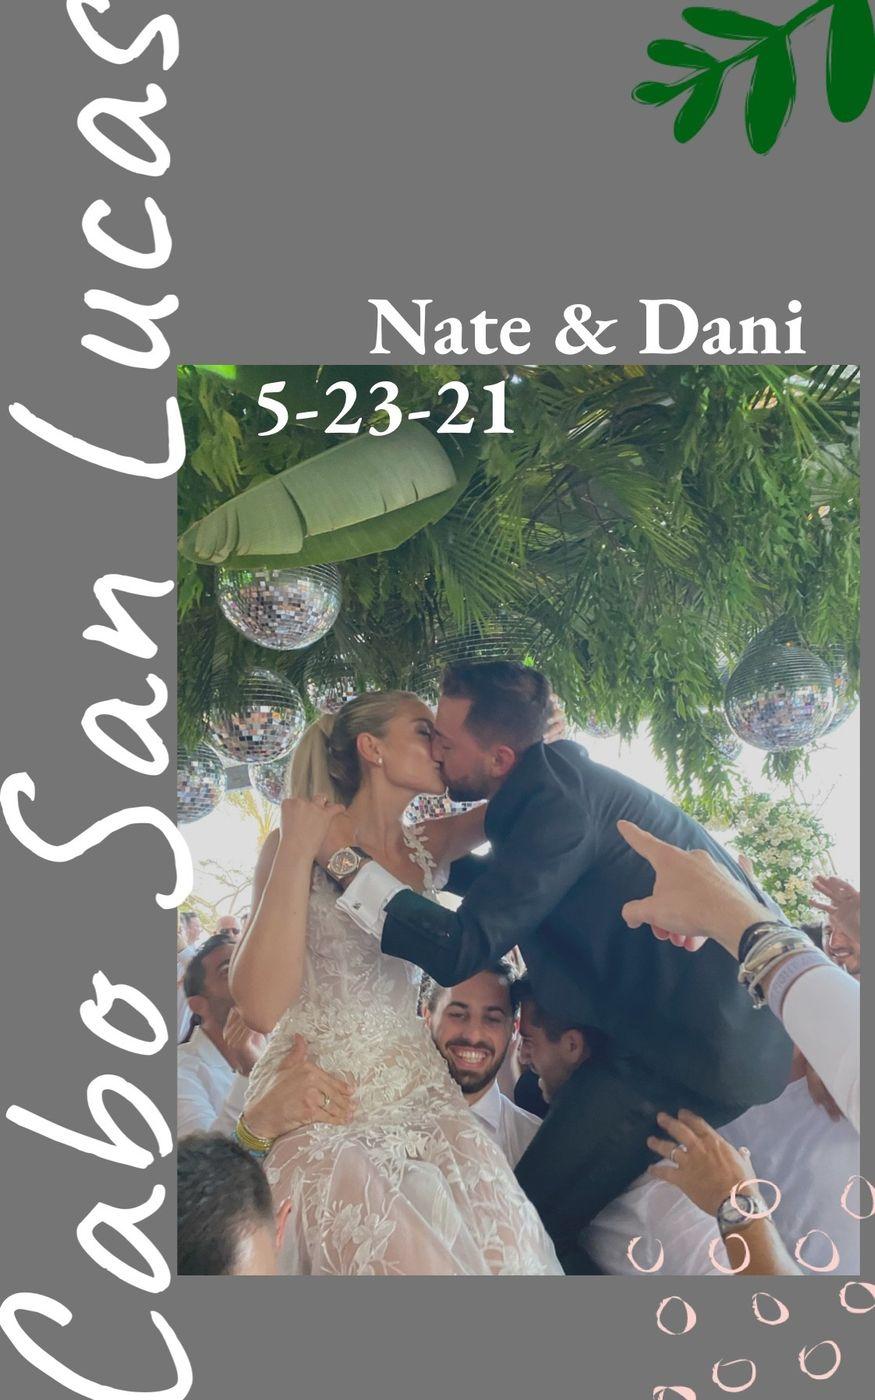 Nate & Dani Wedding! Chileno Bay, Cabo San Lucas.  5/23/21